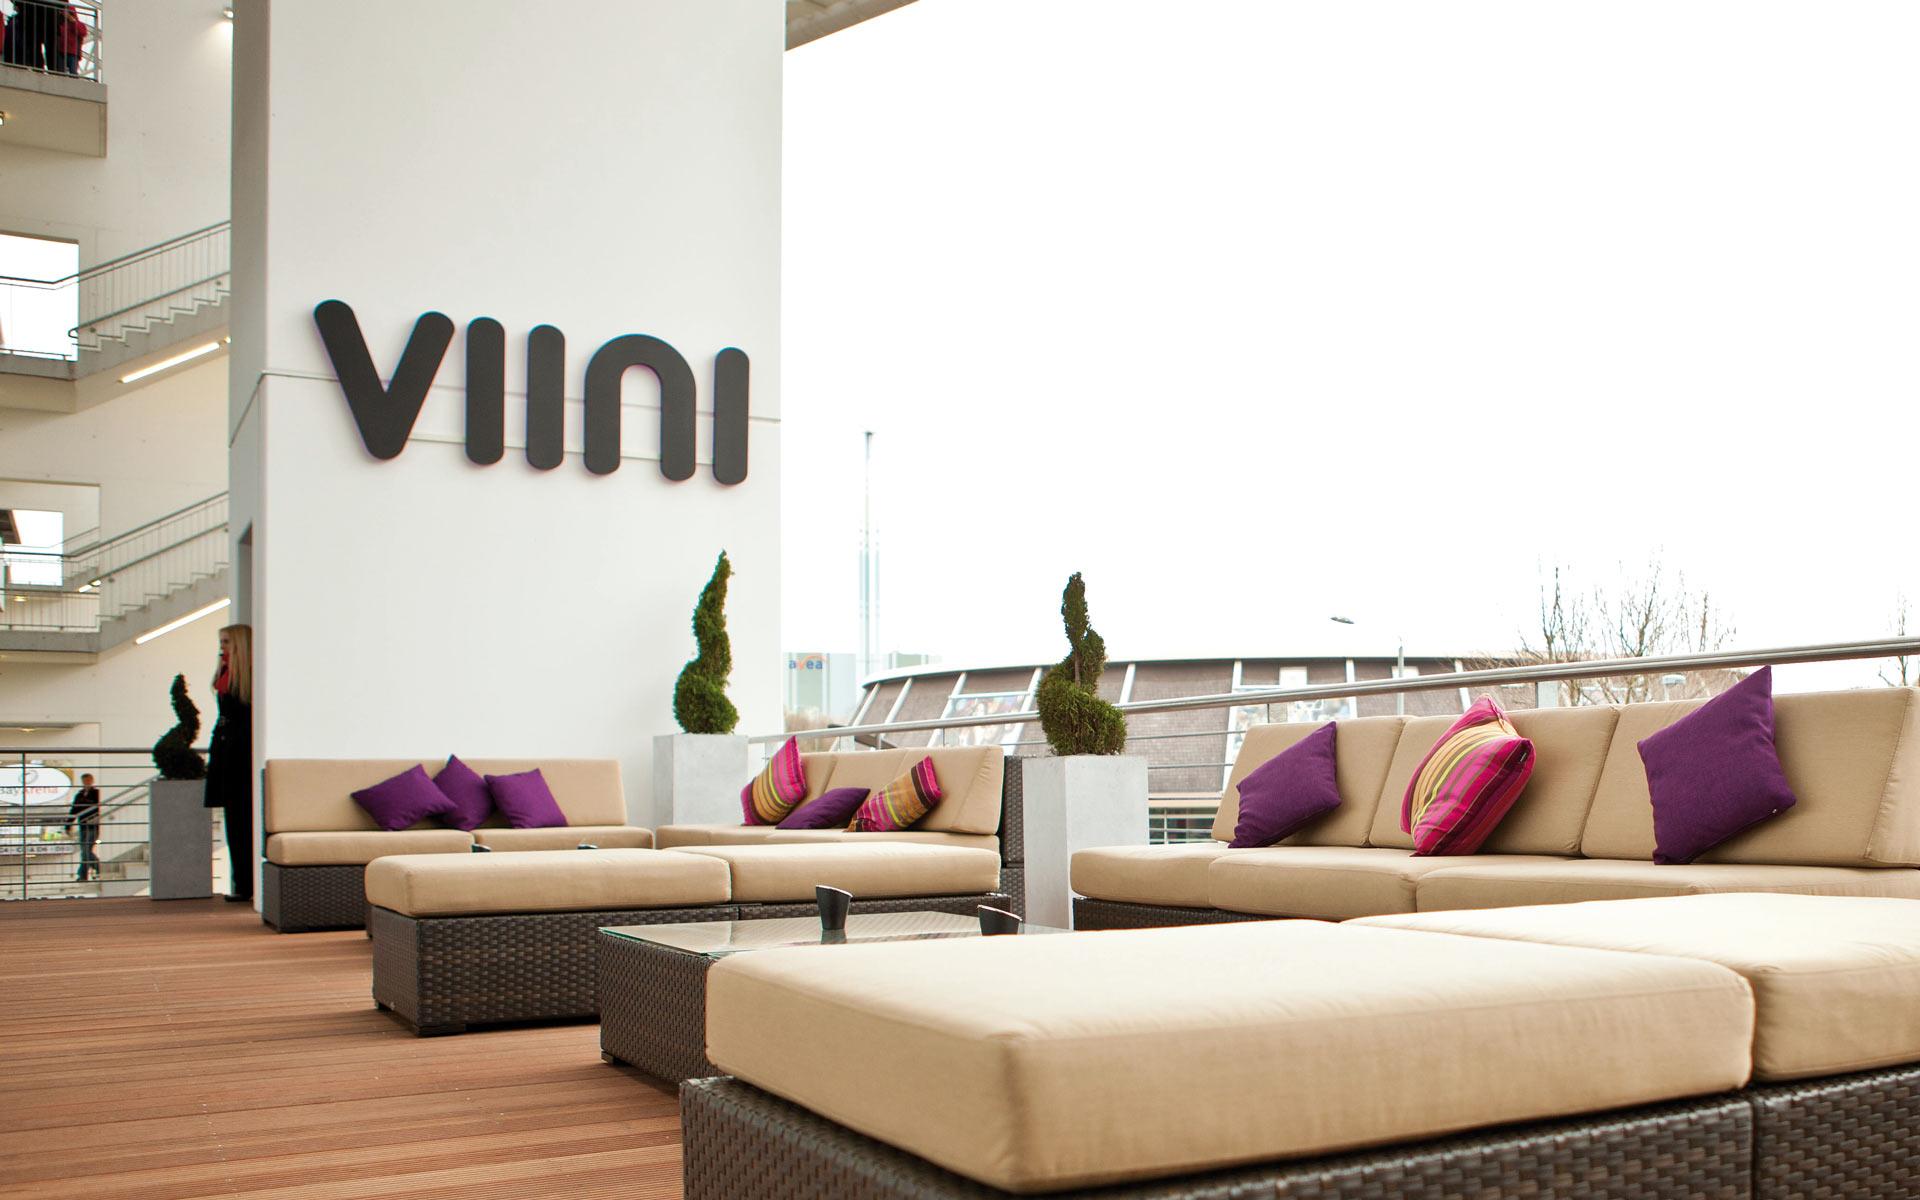 VIINI Brand Identity, Corporate Design, Interiour, Balkon, Branding der Fassade